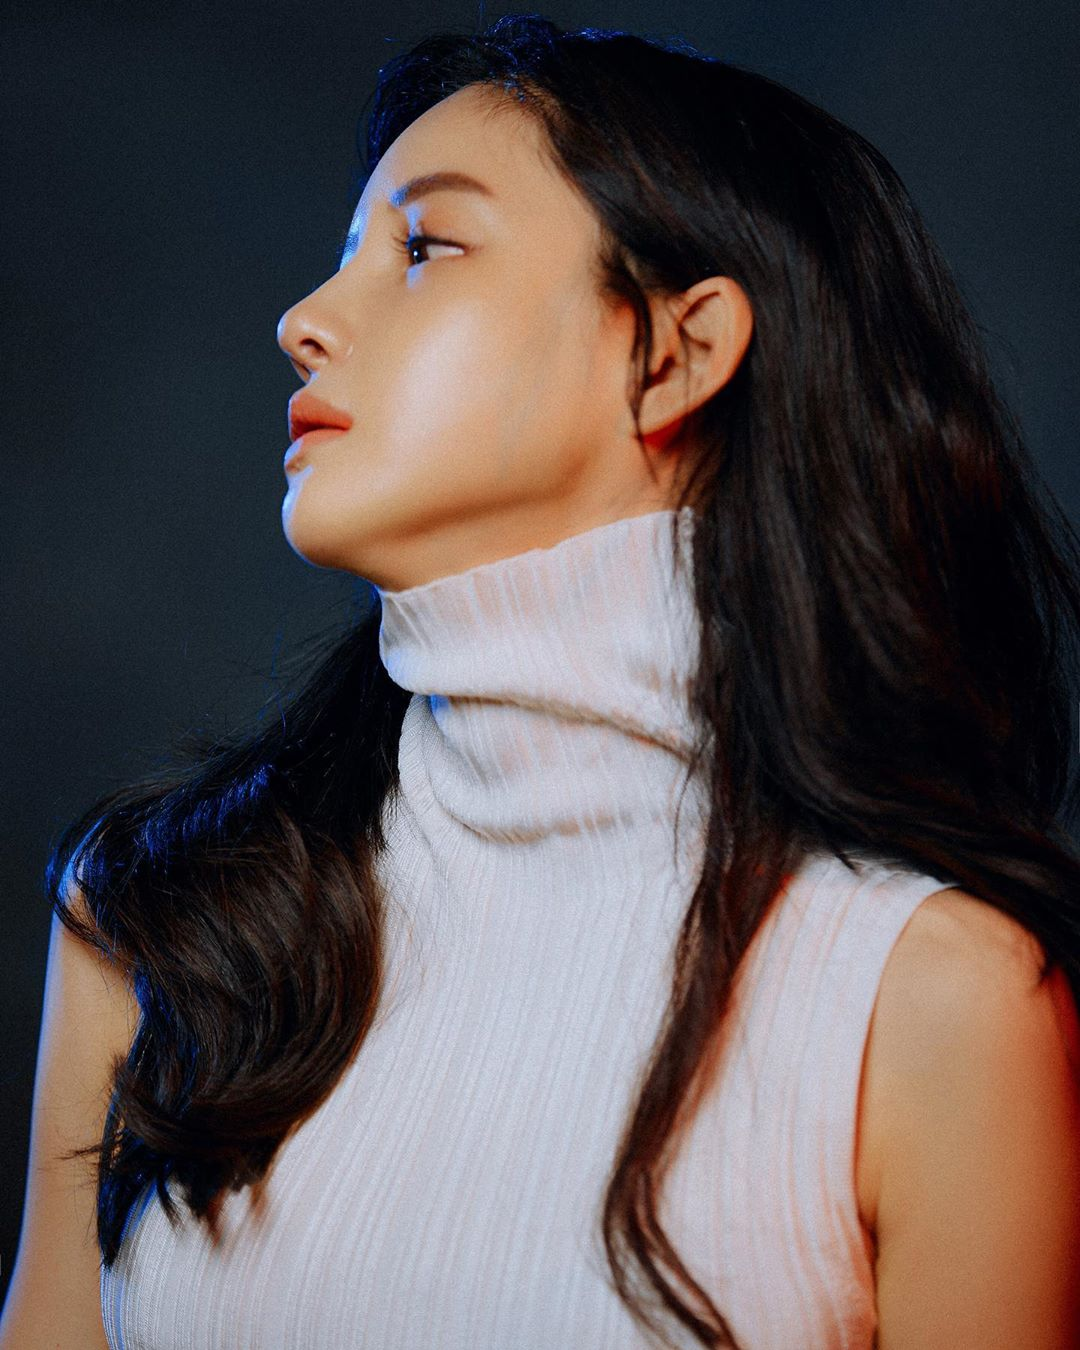 Seojin-Ban-Wallpapers-Insta-Fit-Bio-9